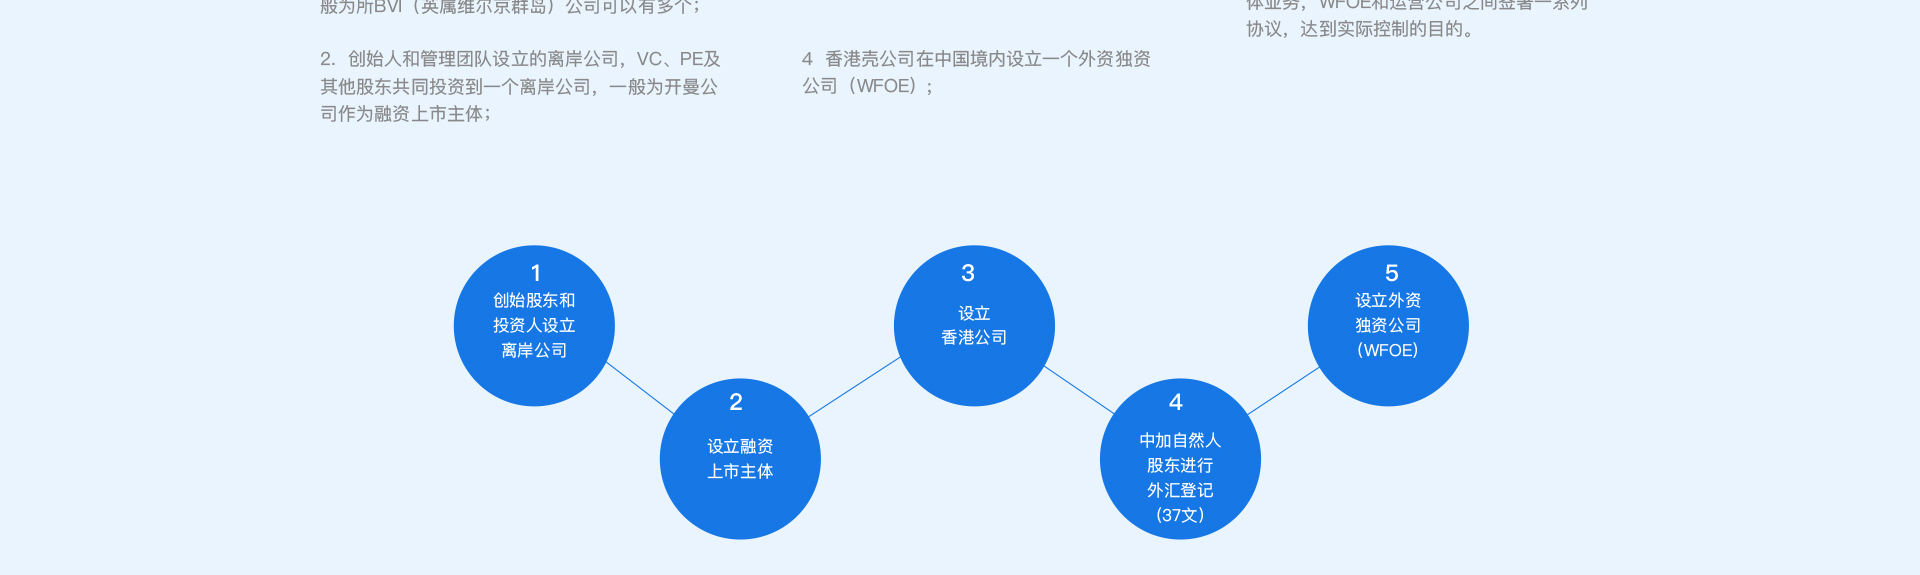 VIE架构设计_06.jpg